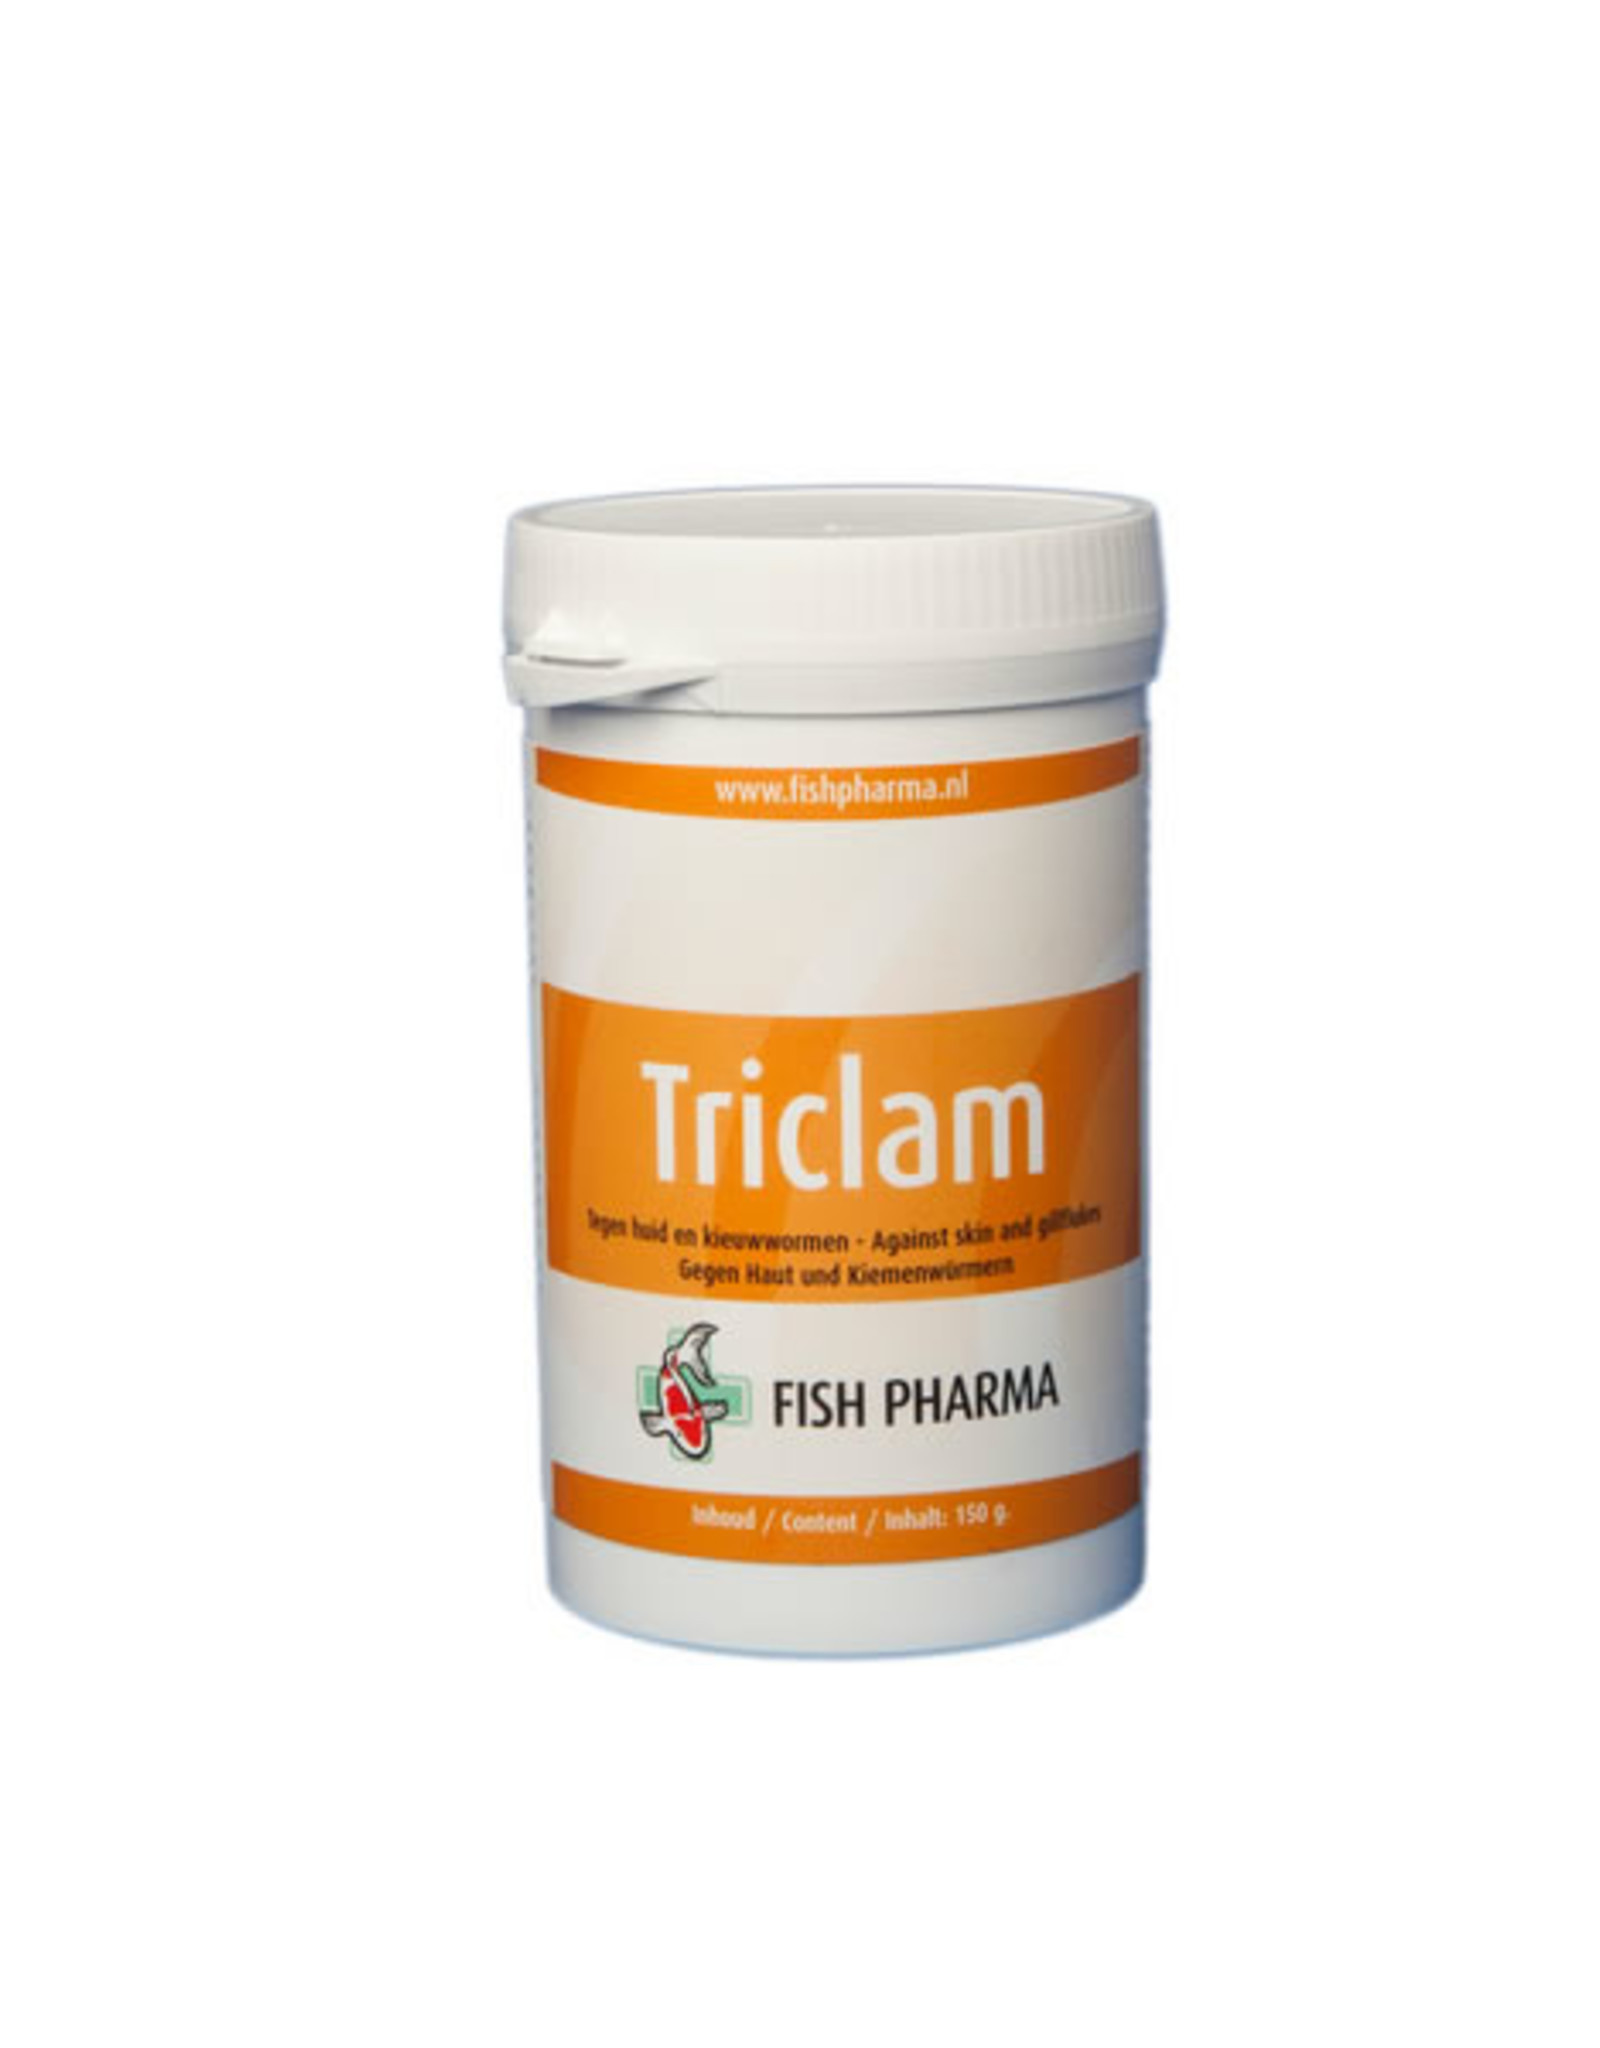 Fish pharma Triclam 150g